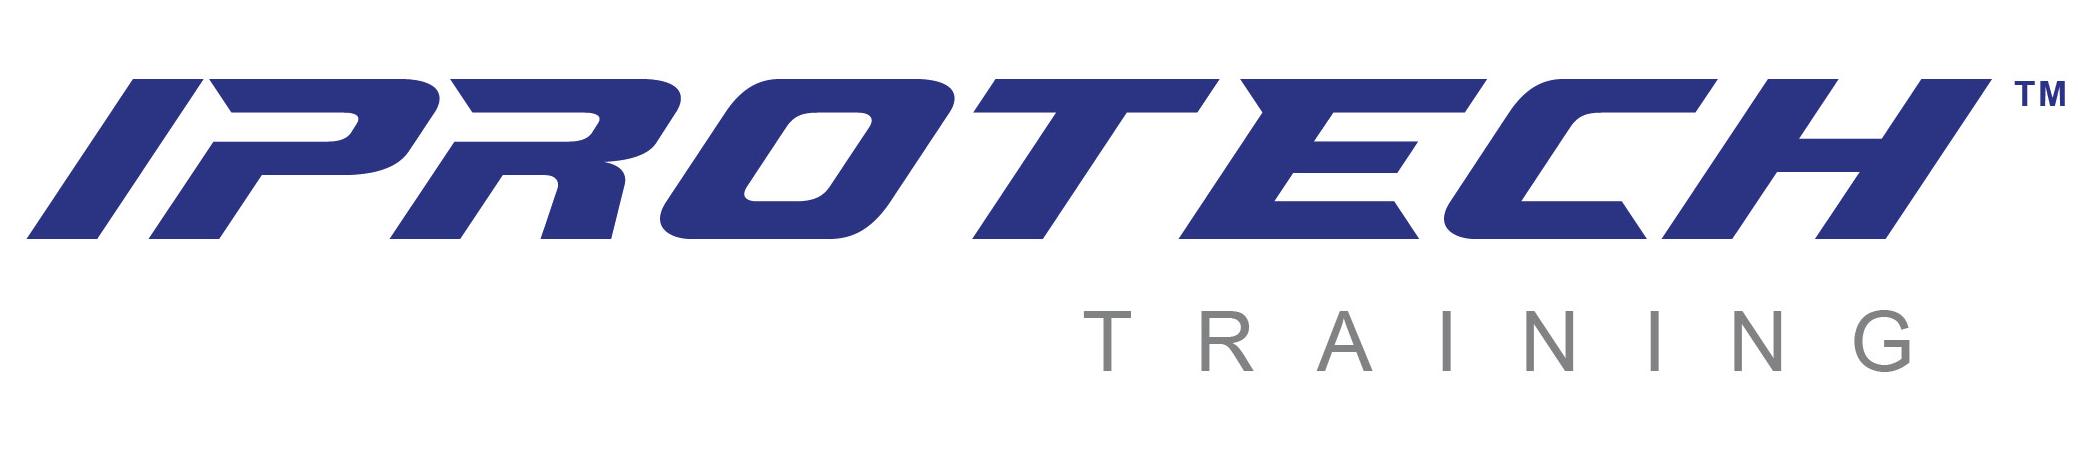 iprotech training logo